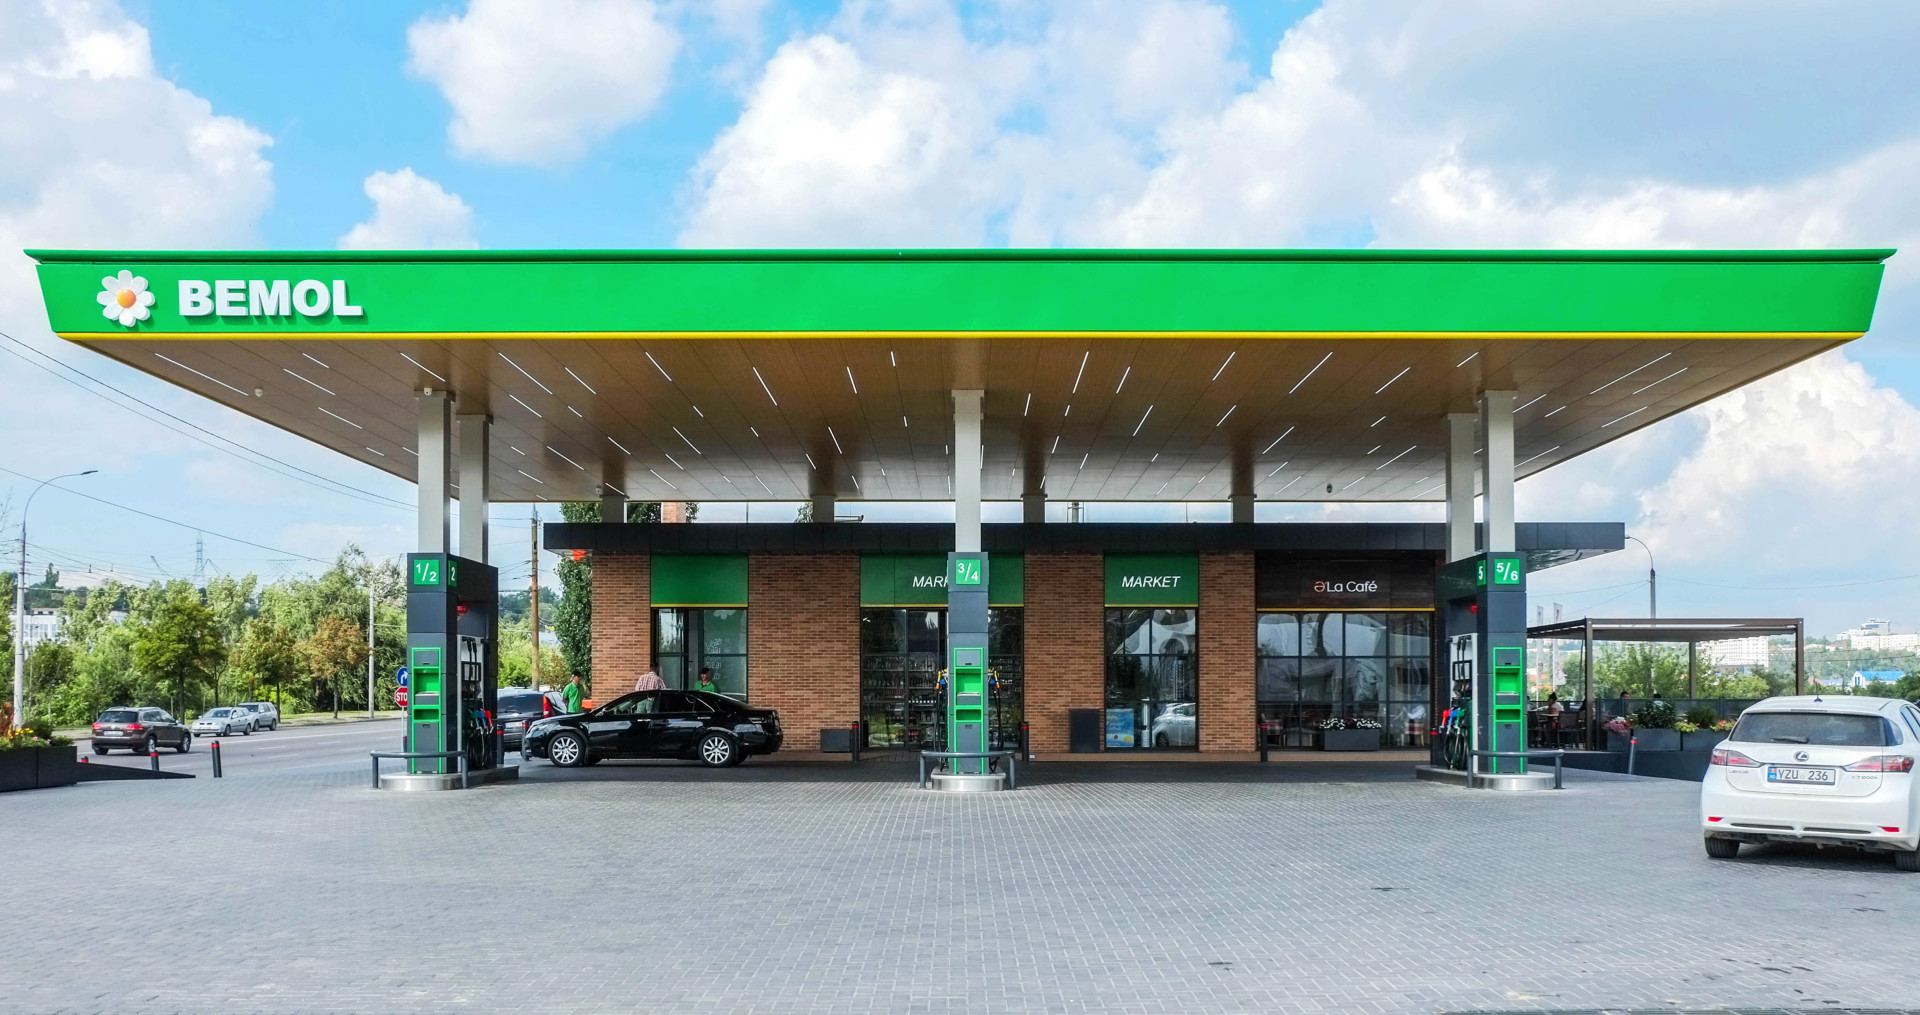 Wisp-Bemol-gas-station-Main-facade-view